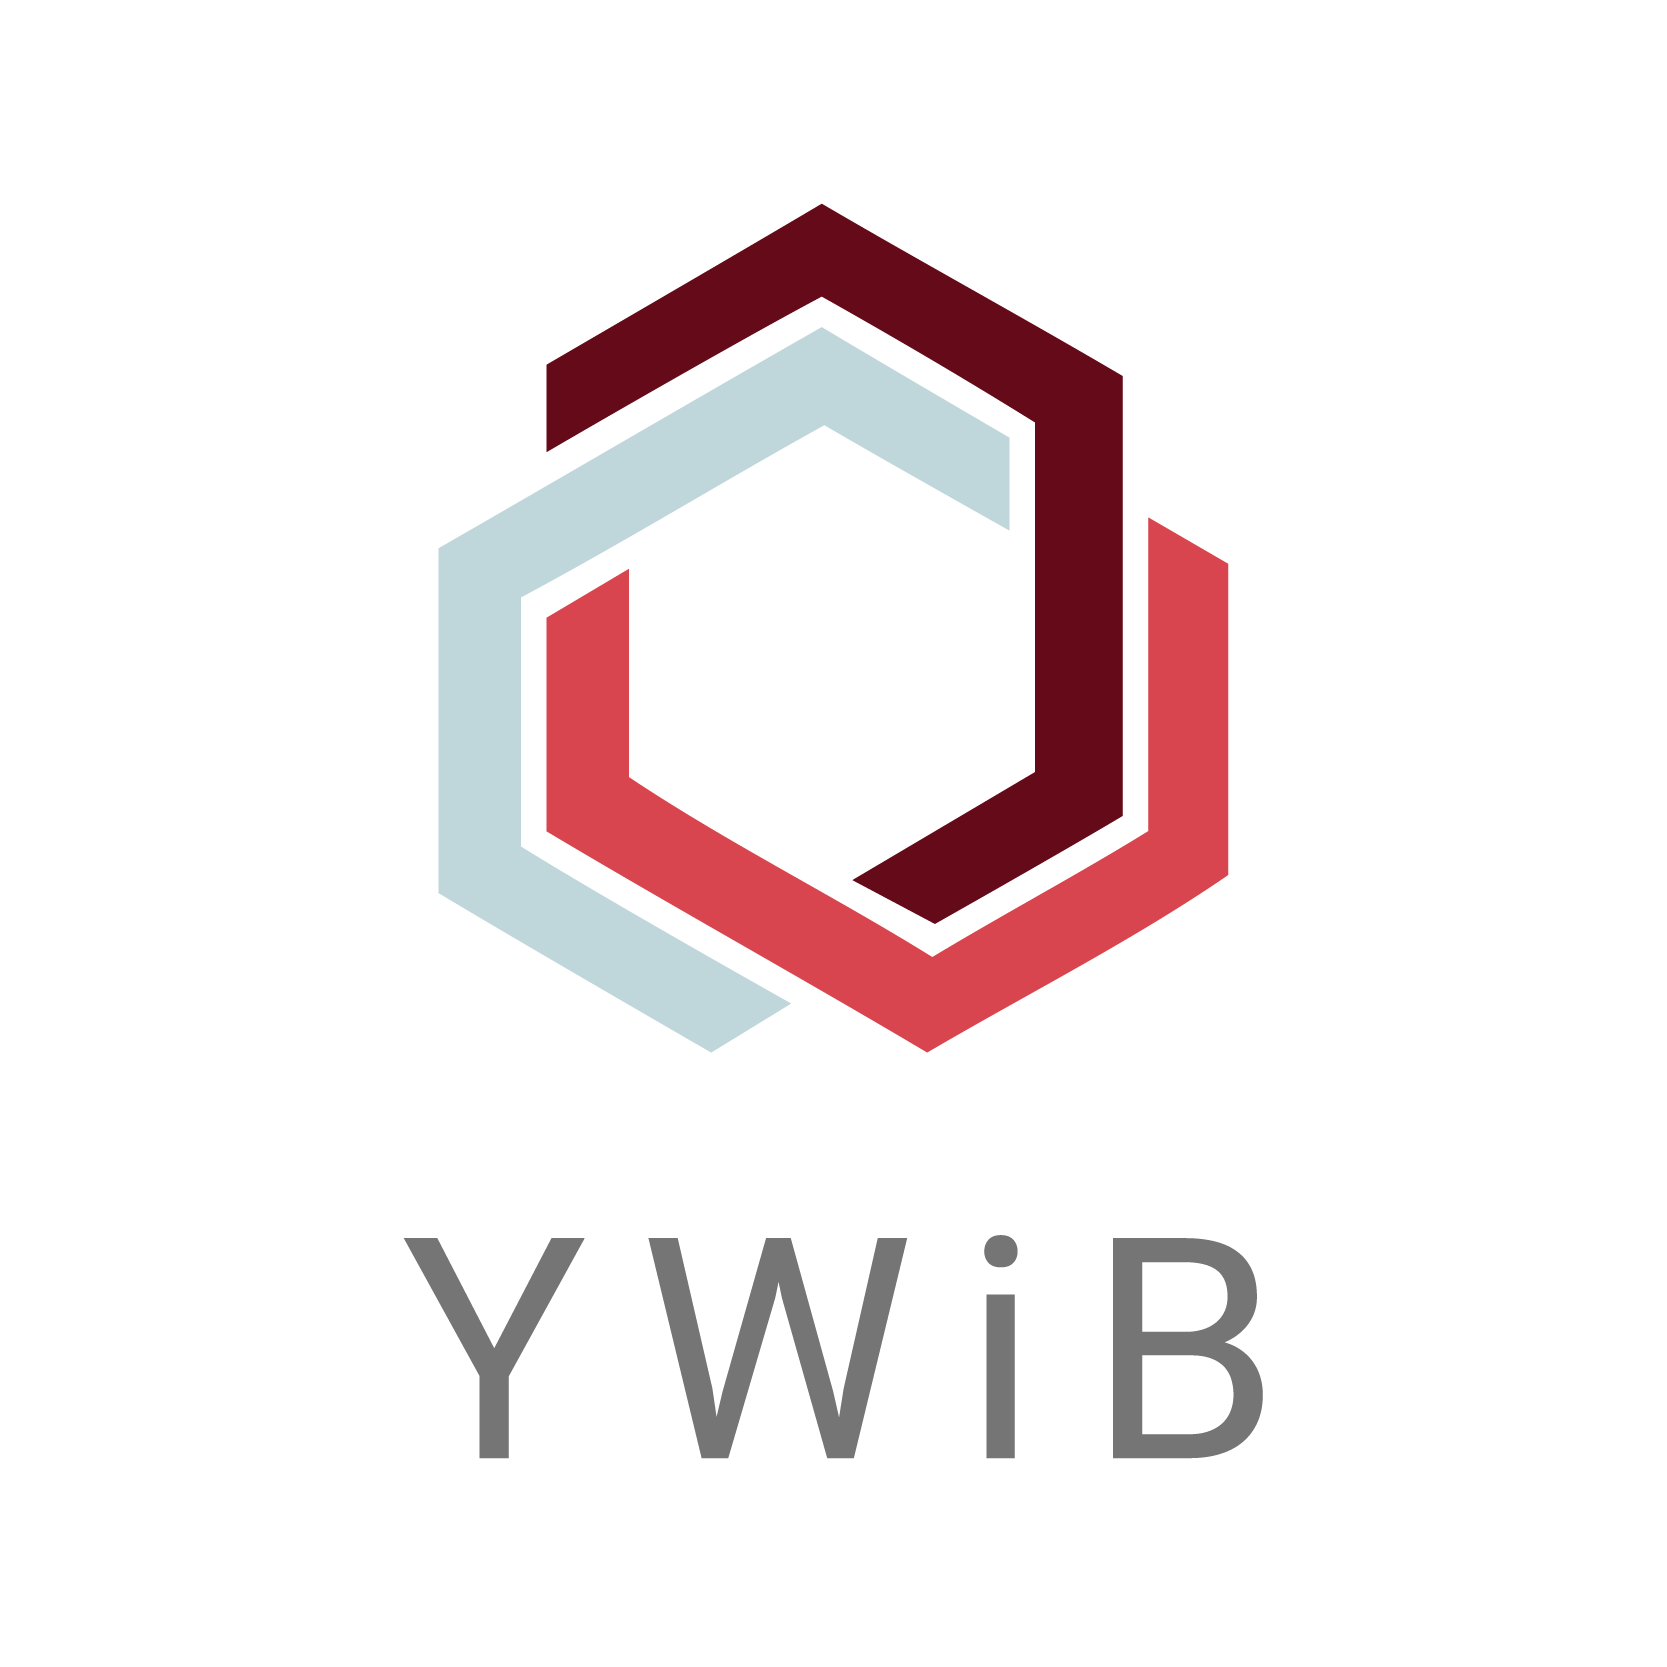 YWiB Logo